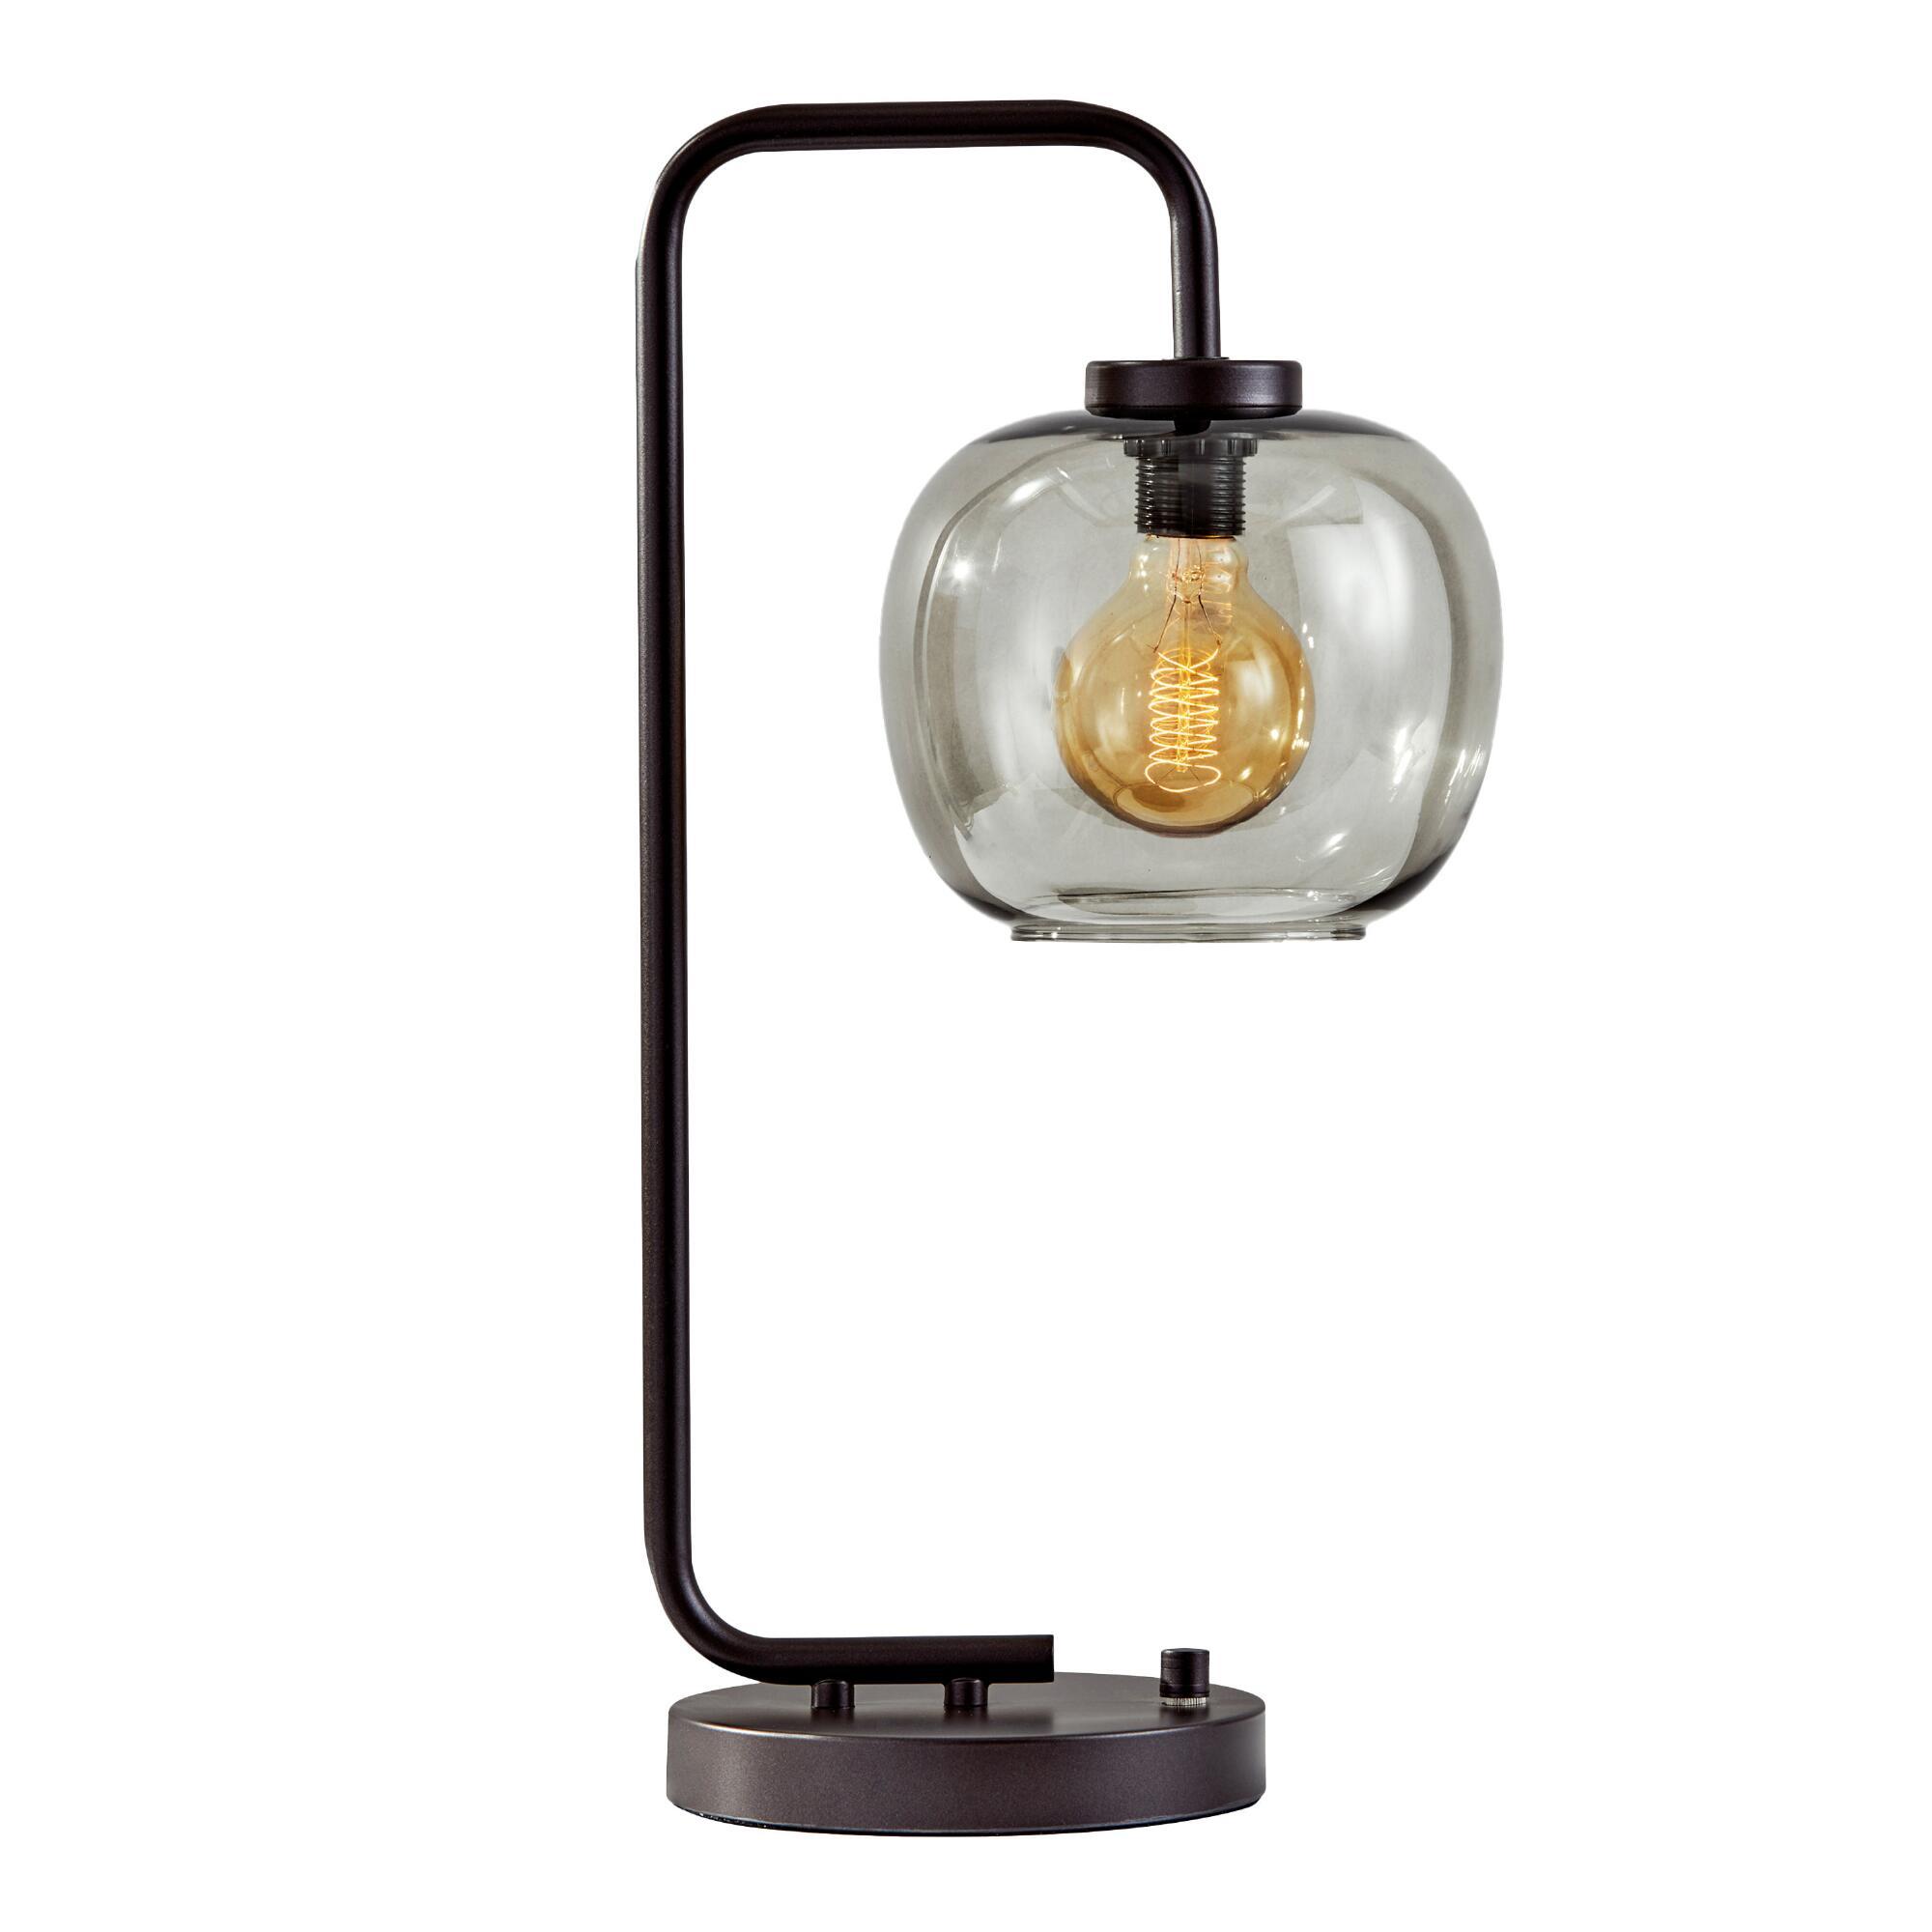 Matte Black And Smoky Glass Meyer Table Lamp $179.99